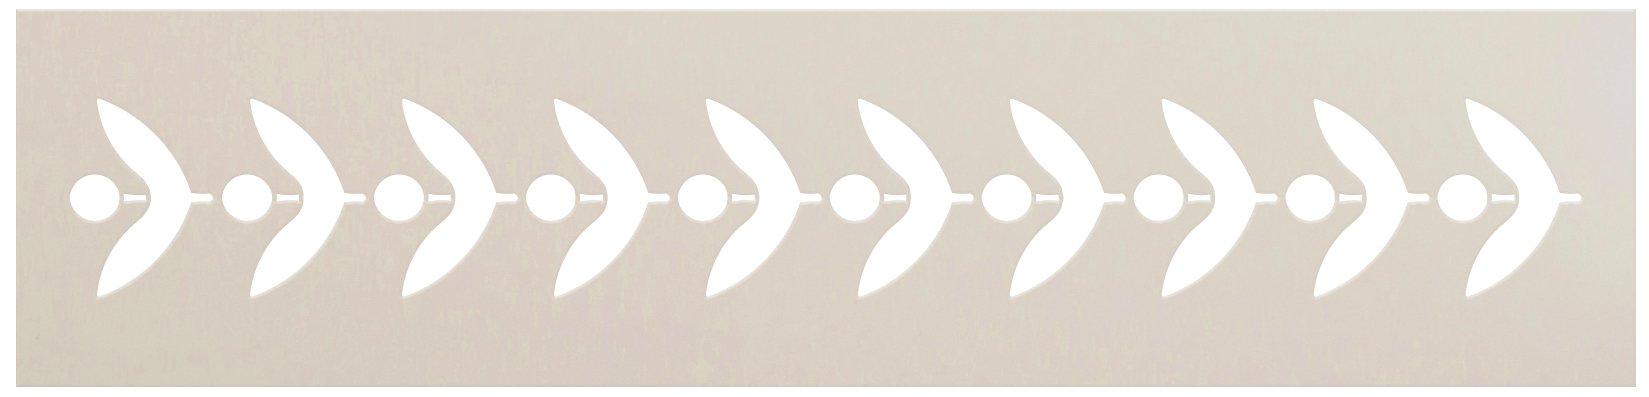 Leaf Border Line Pattern Stencil by StudioR12 | DIY Minimalist Greek Petal Home Decor | Craft & Paint Wood Sign Reusable Mylar Template | Select Size